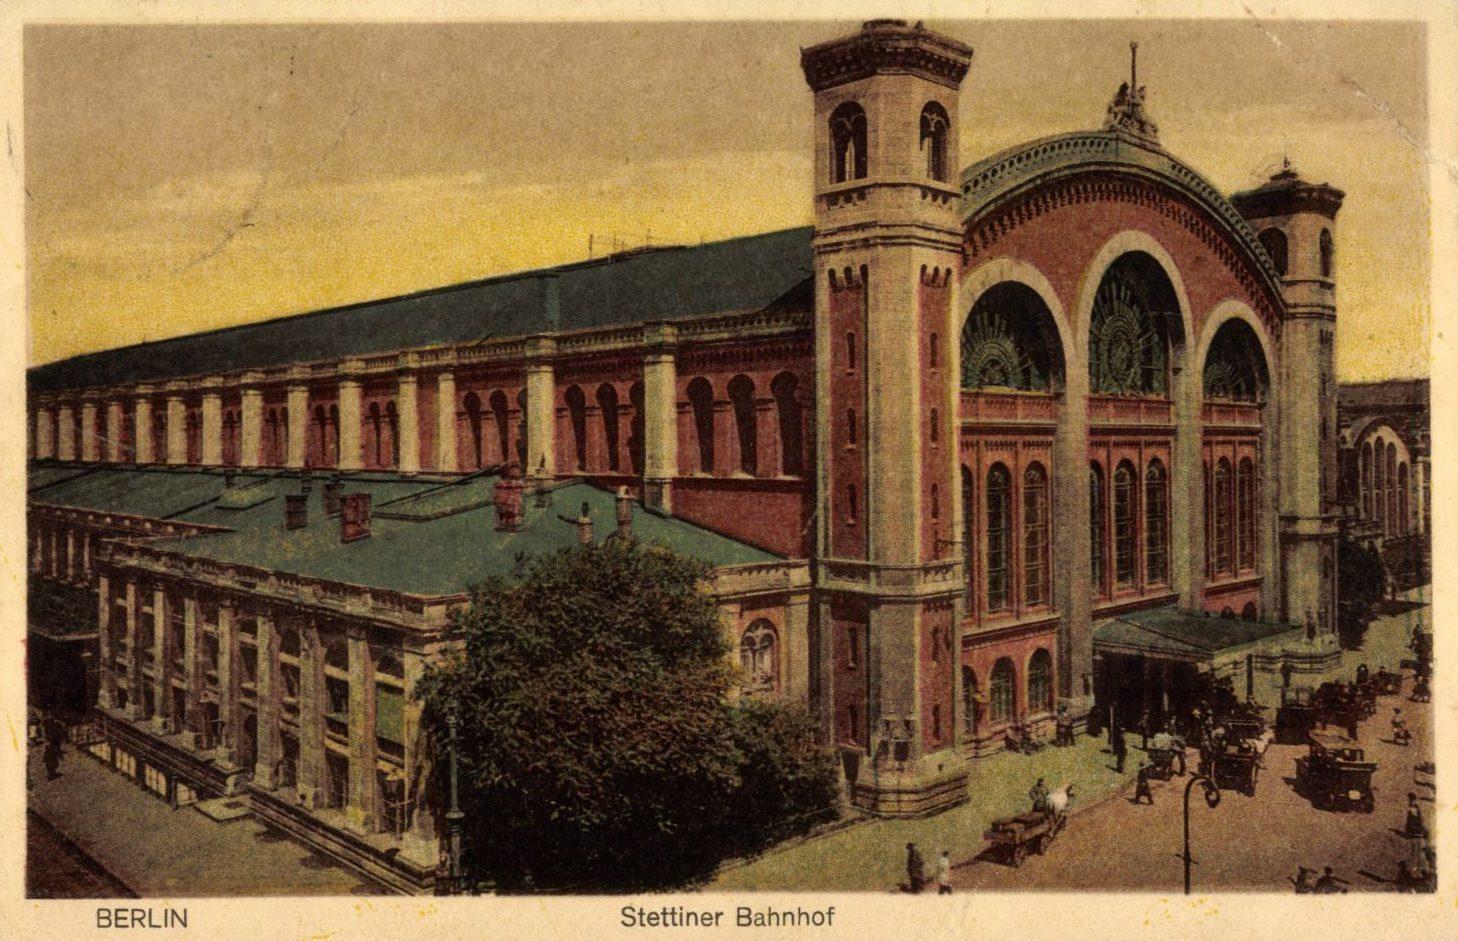 Berlin Bahnhöfe: Blick auf den Stettiner Bahnhof, 1931. Foto: Imago/Arkivi